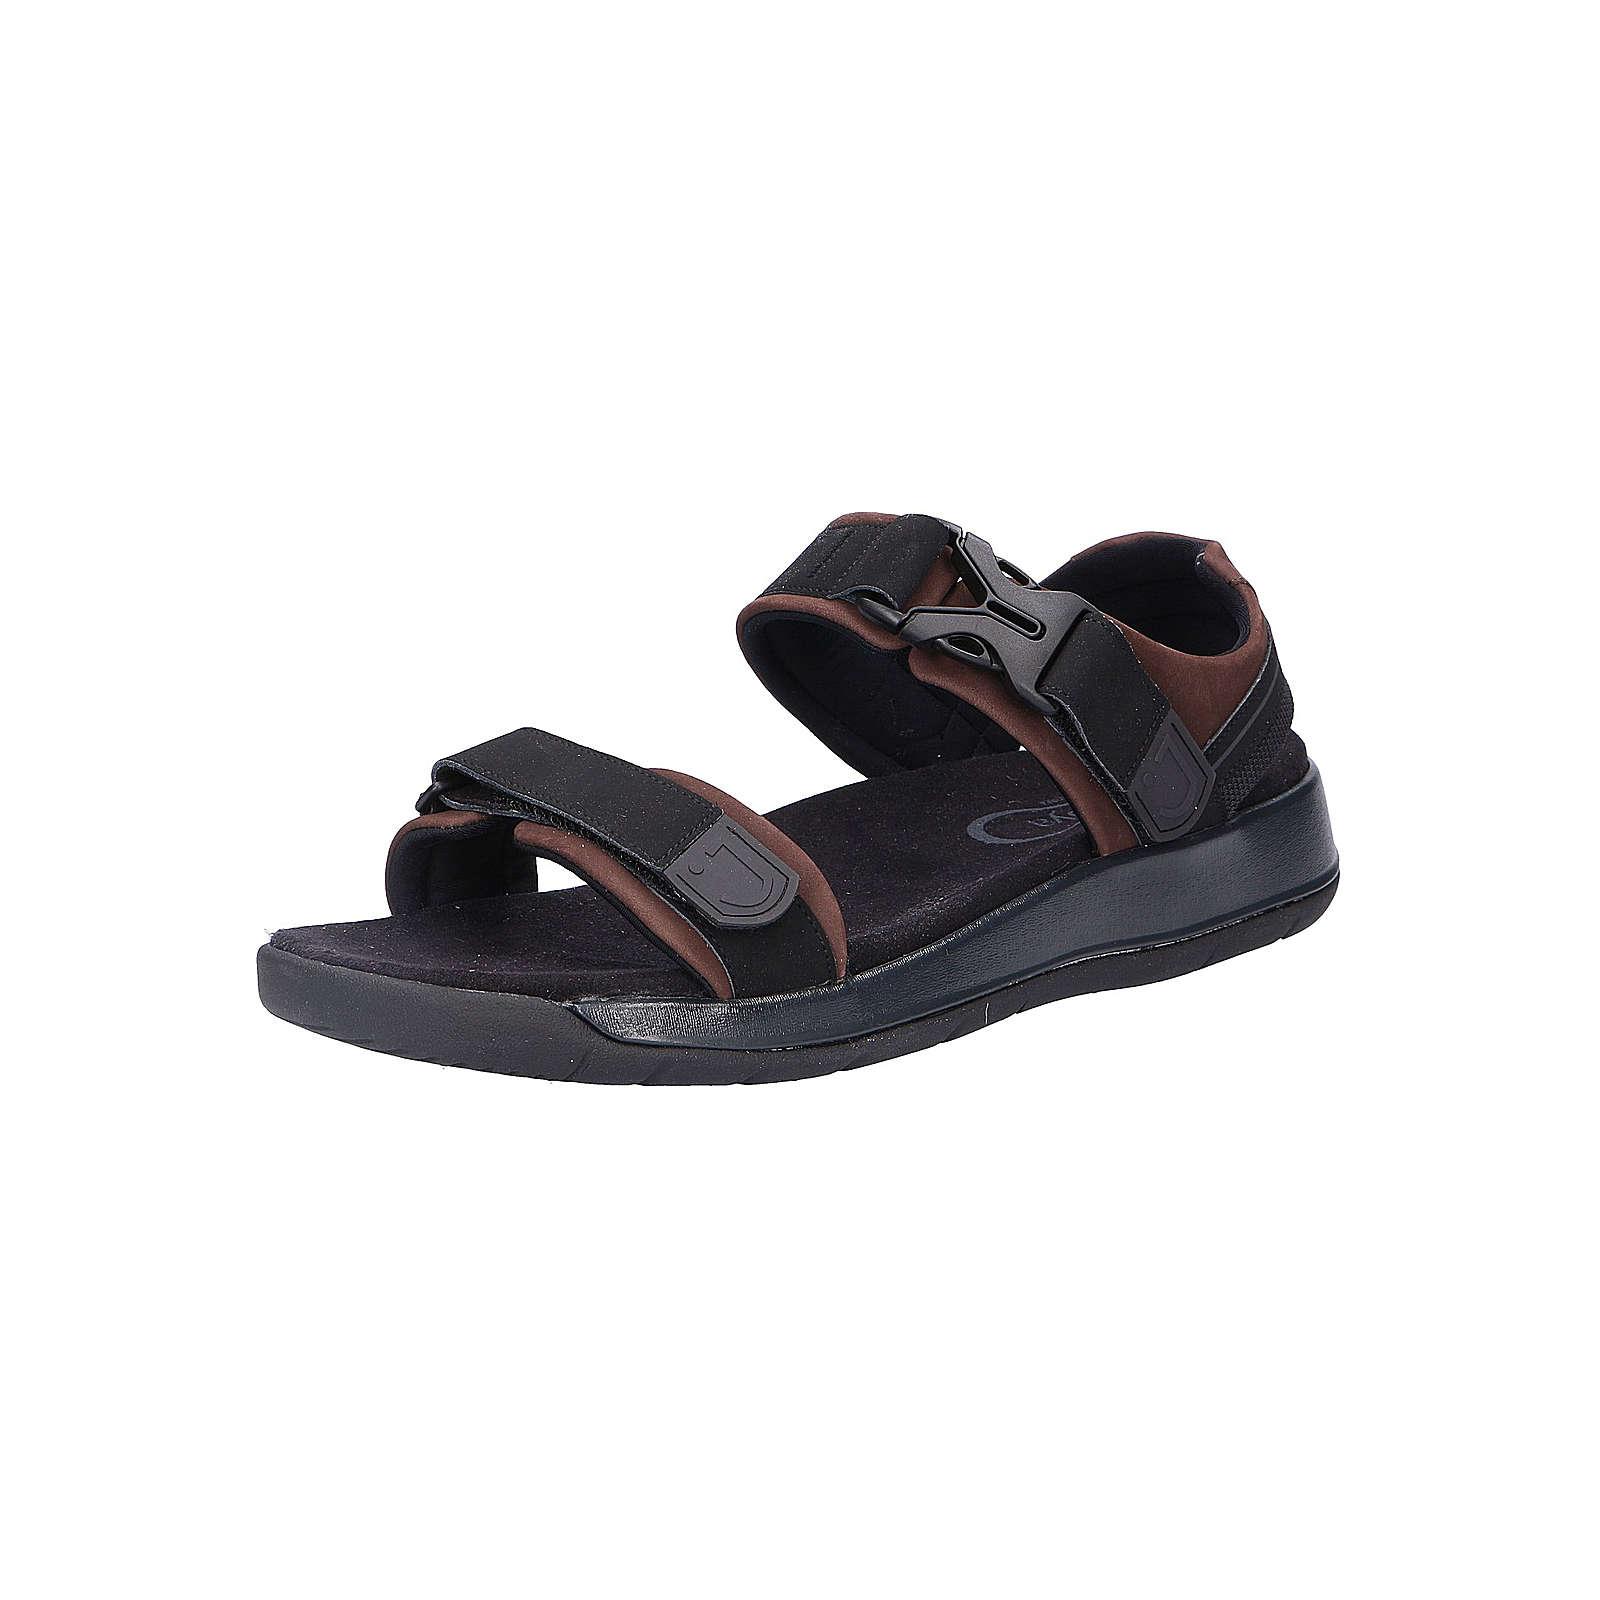 Joya Comfort Sandale CAPRI III BROWN Komfort-Sandalen braun Herren Gr. 44